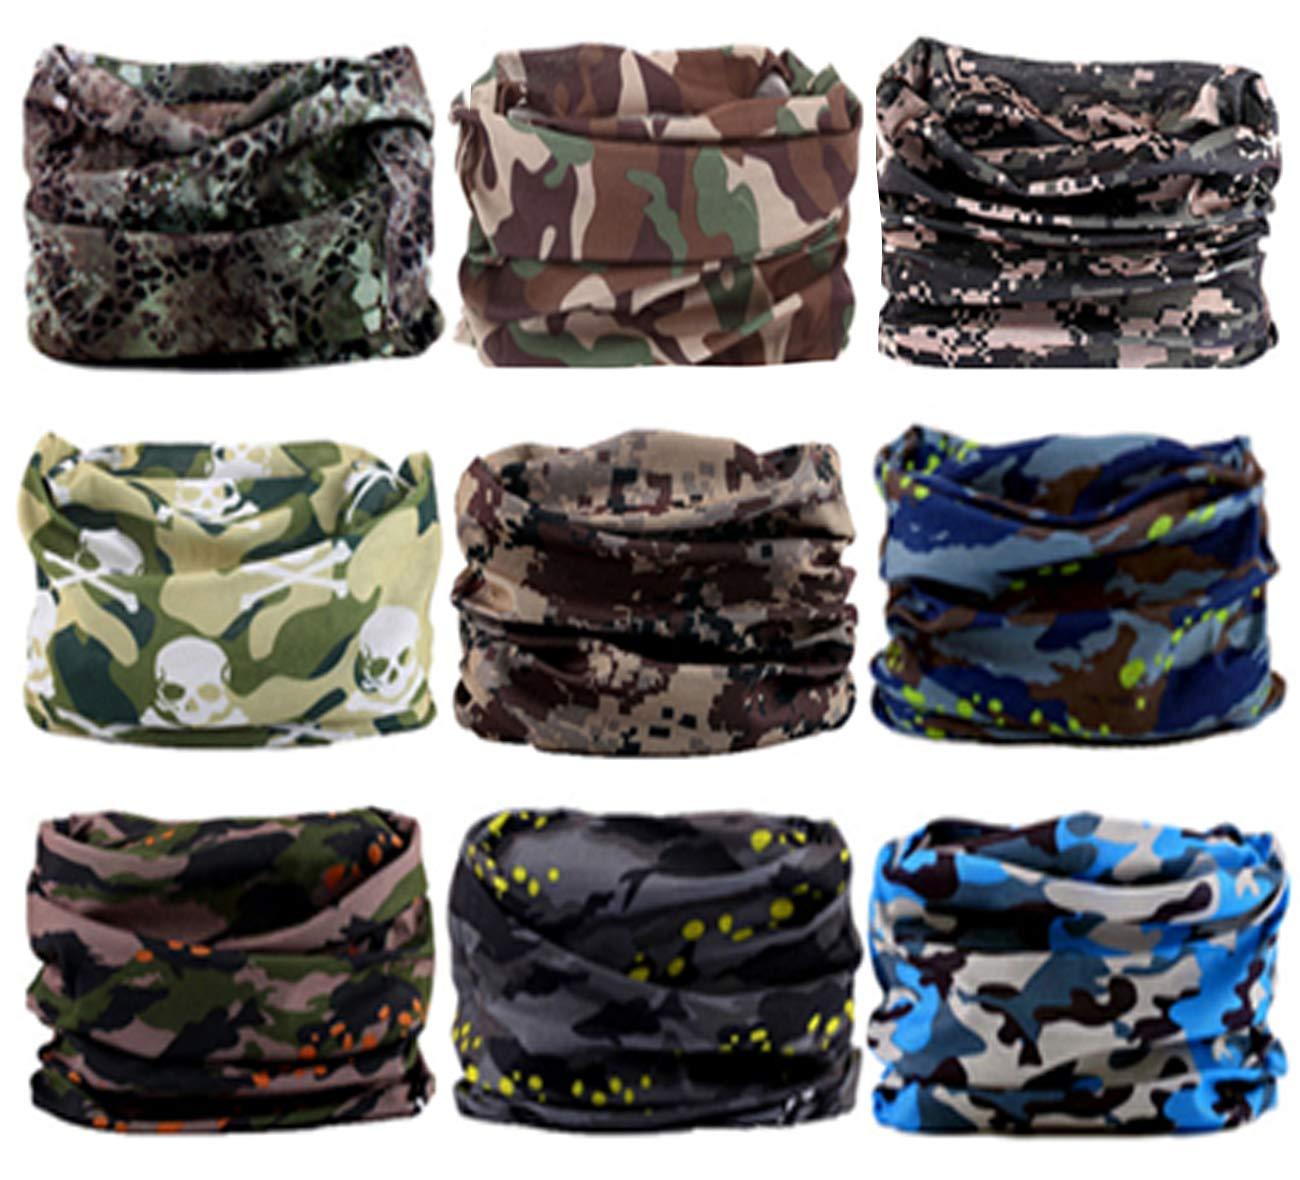 SmilerSmile 6pcs Assorted Seamless Outdoor Sport Bandanna Headwrap Scarf Wrap, 12 in 2 High Elastic Magic Headband & Collars Muffler Scarf Face Mask UV Resistance(14 Camo A)